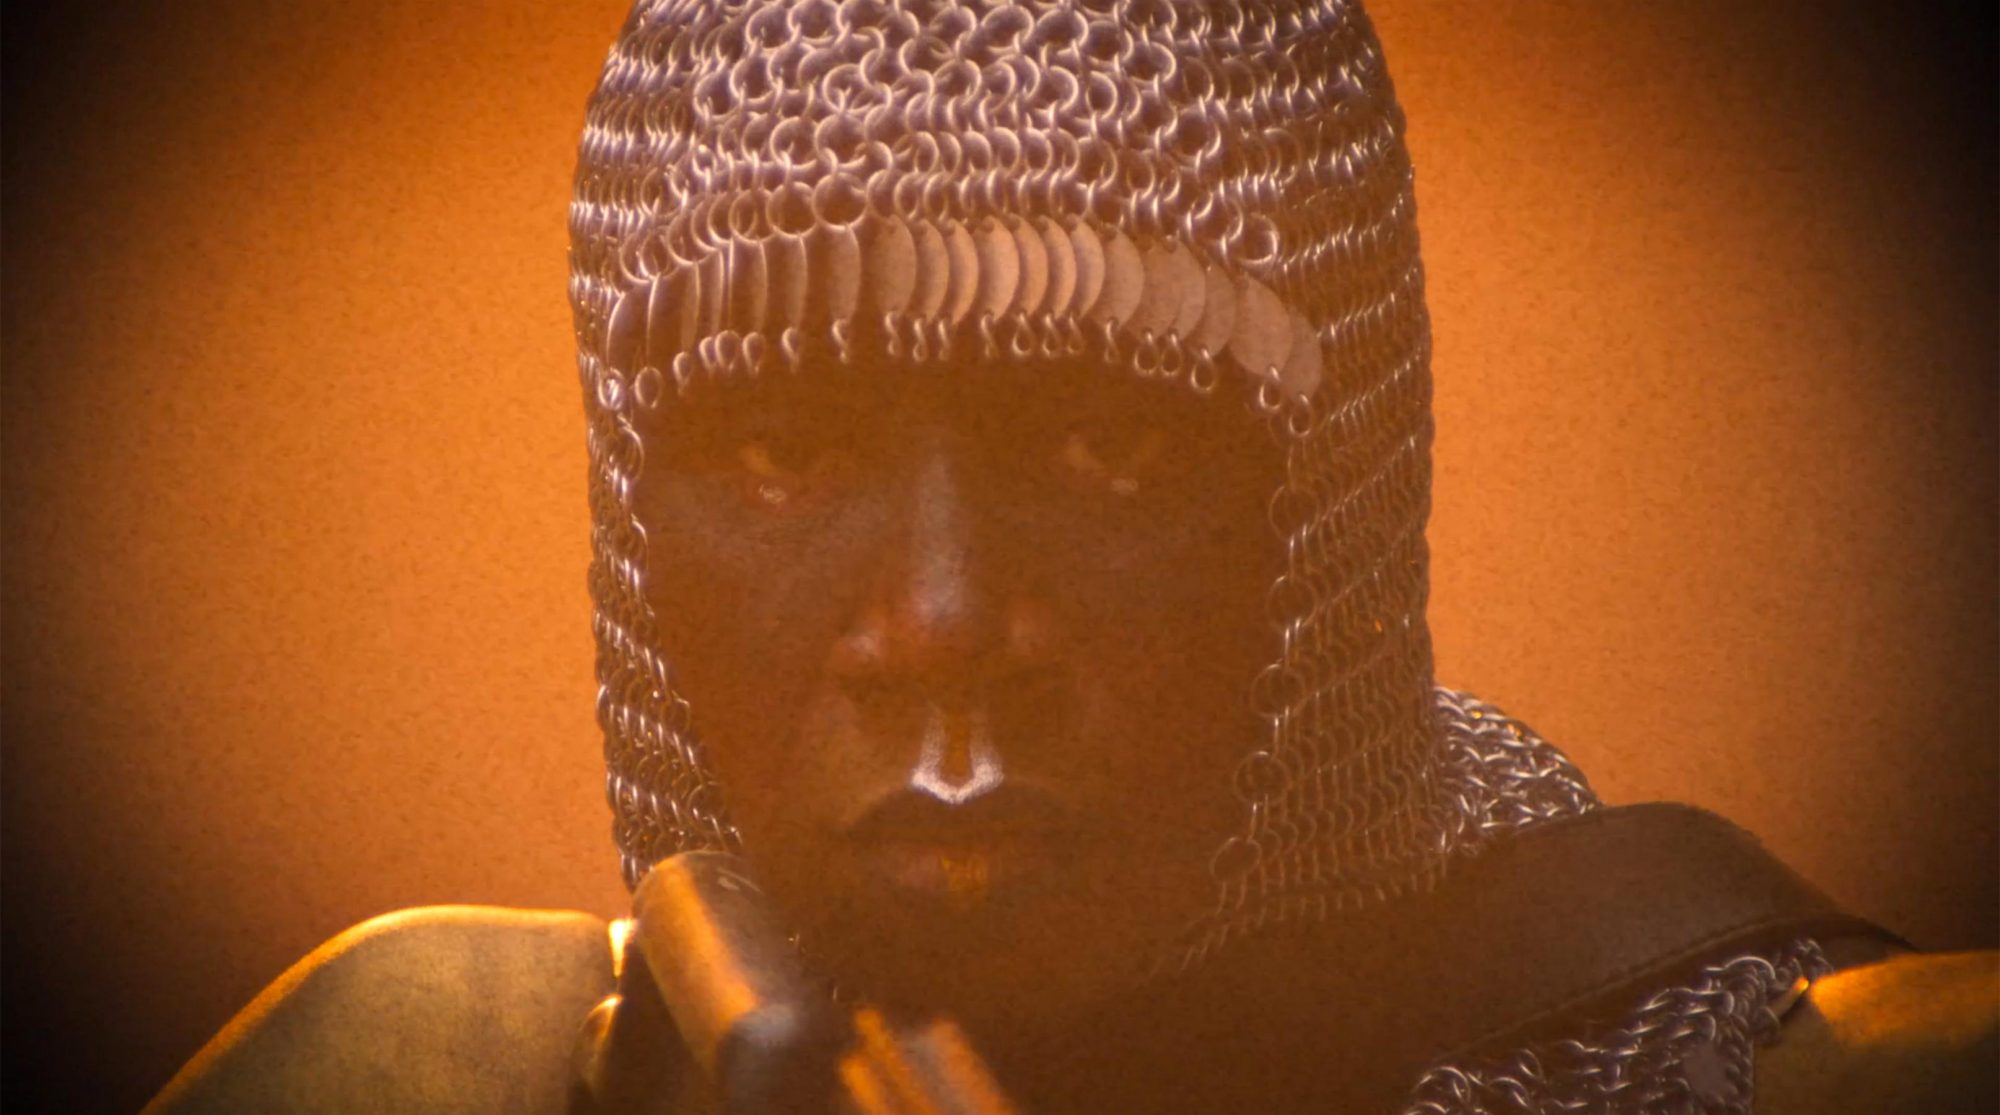 Jay Z Family Feud screen grabCredit: Tidal